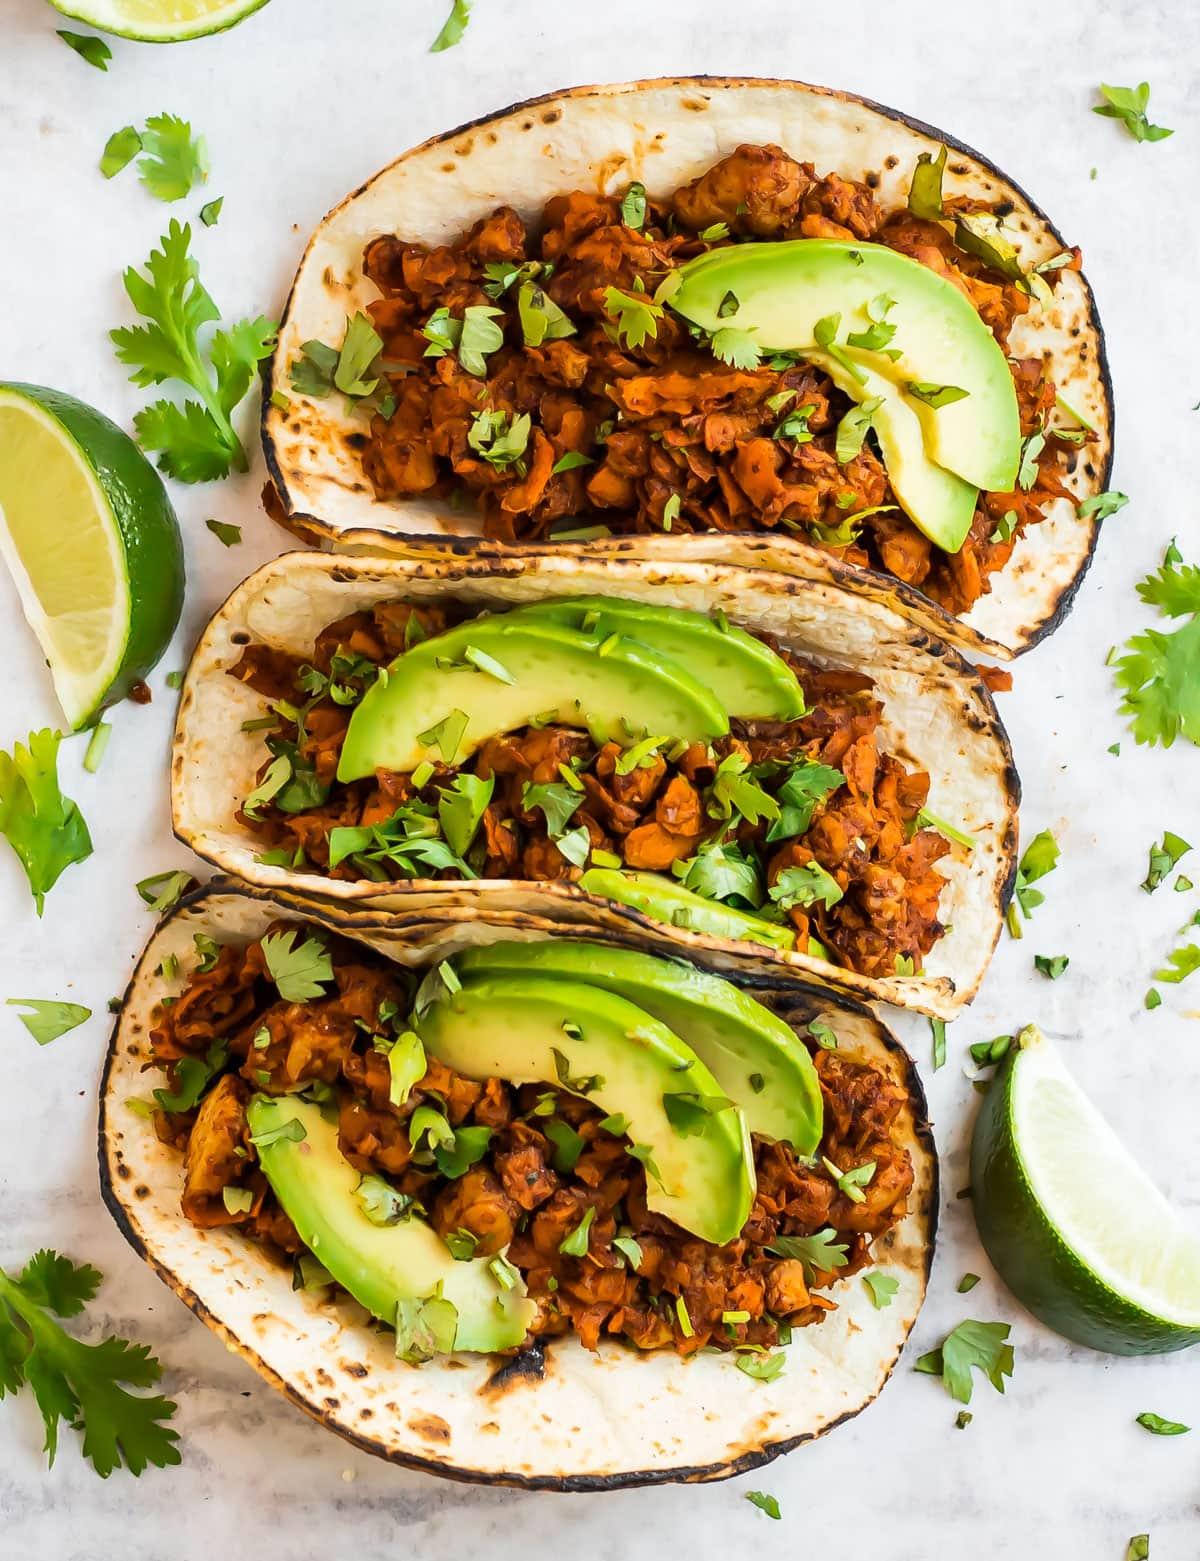 sweet potato tempeh tacos topped with avocado slices